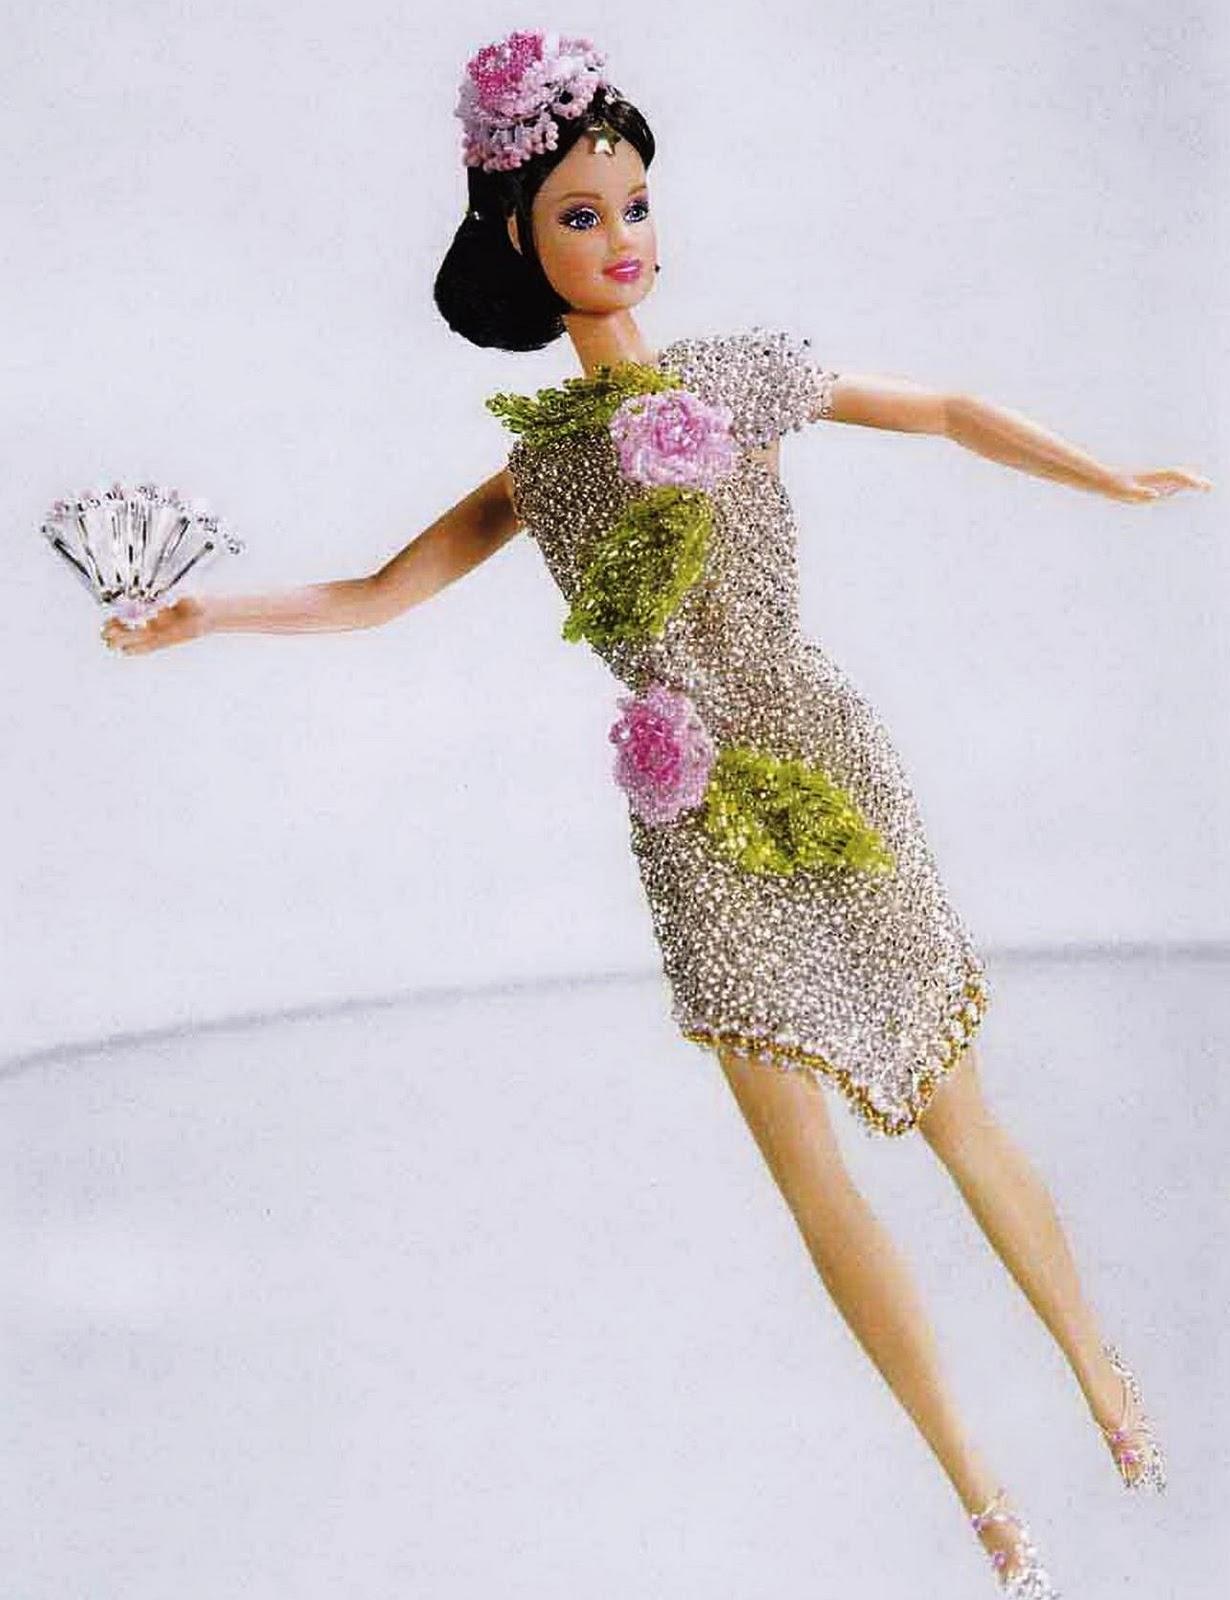 Еще куклы, одетые бисером